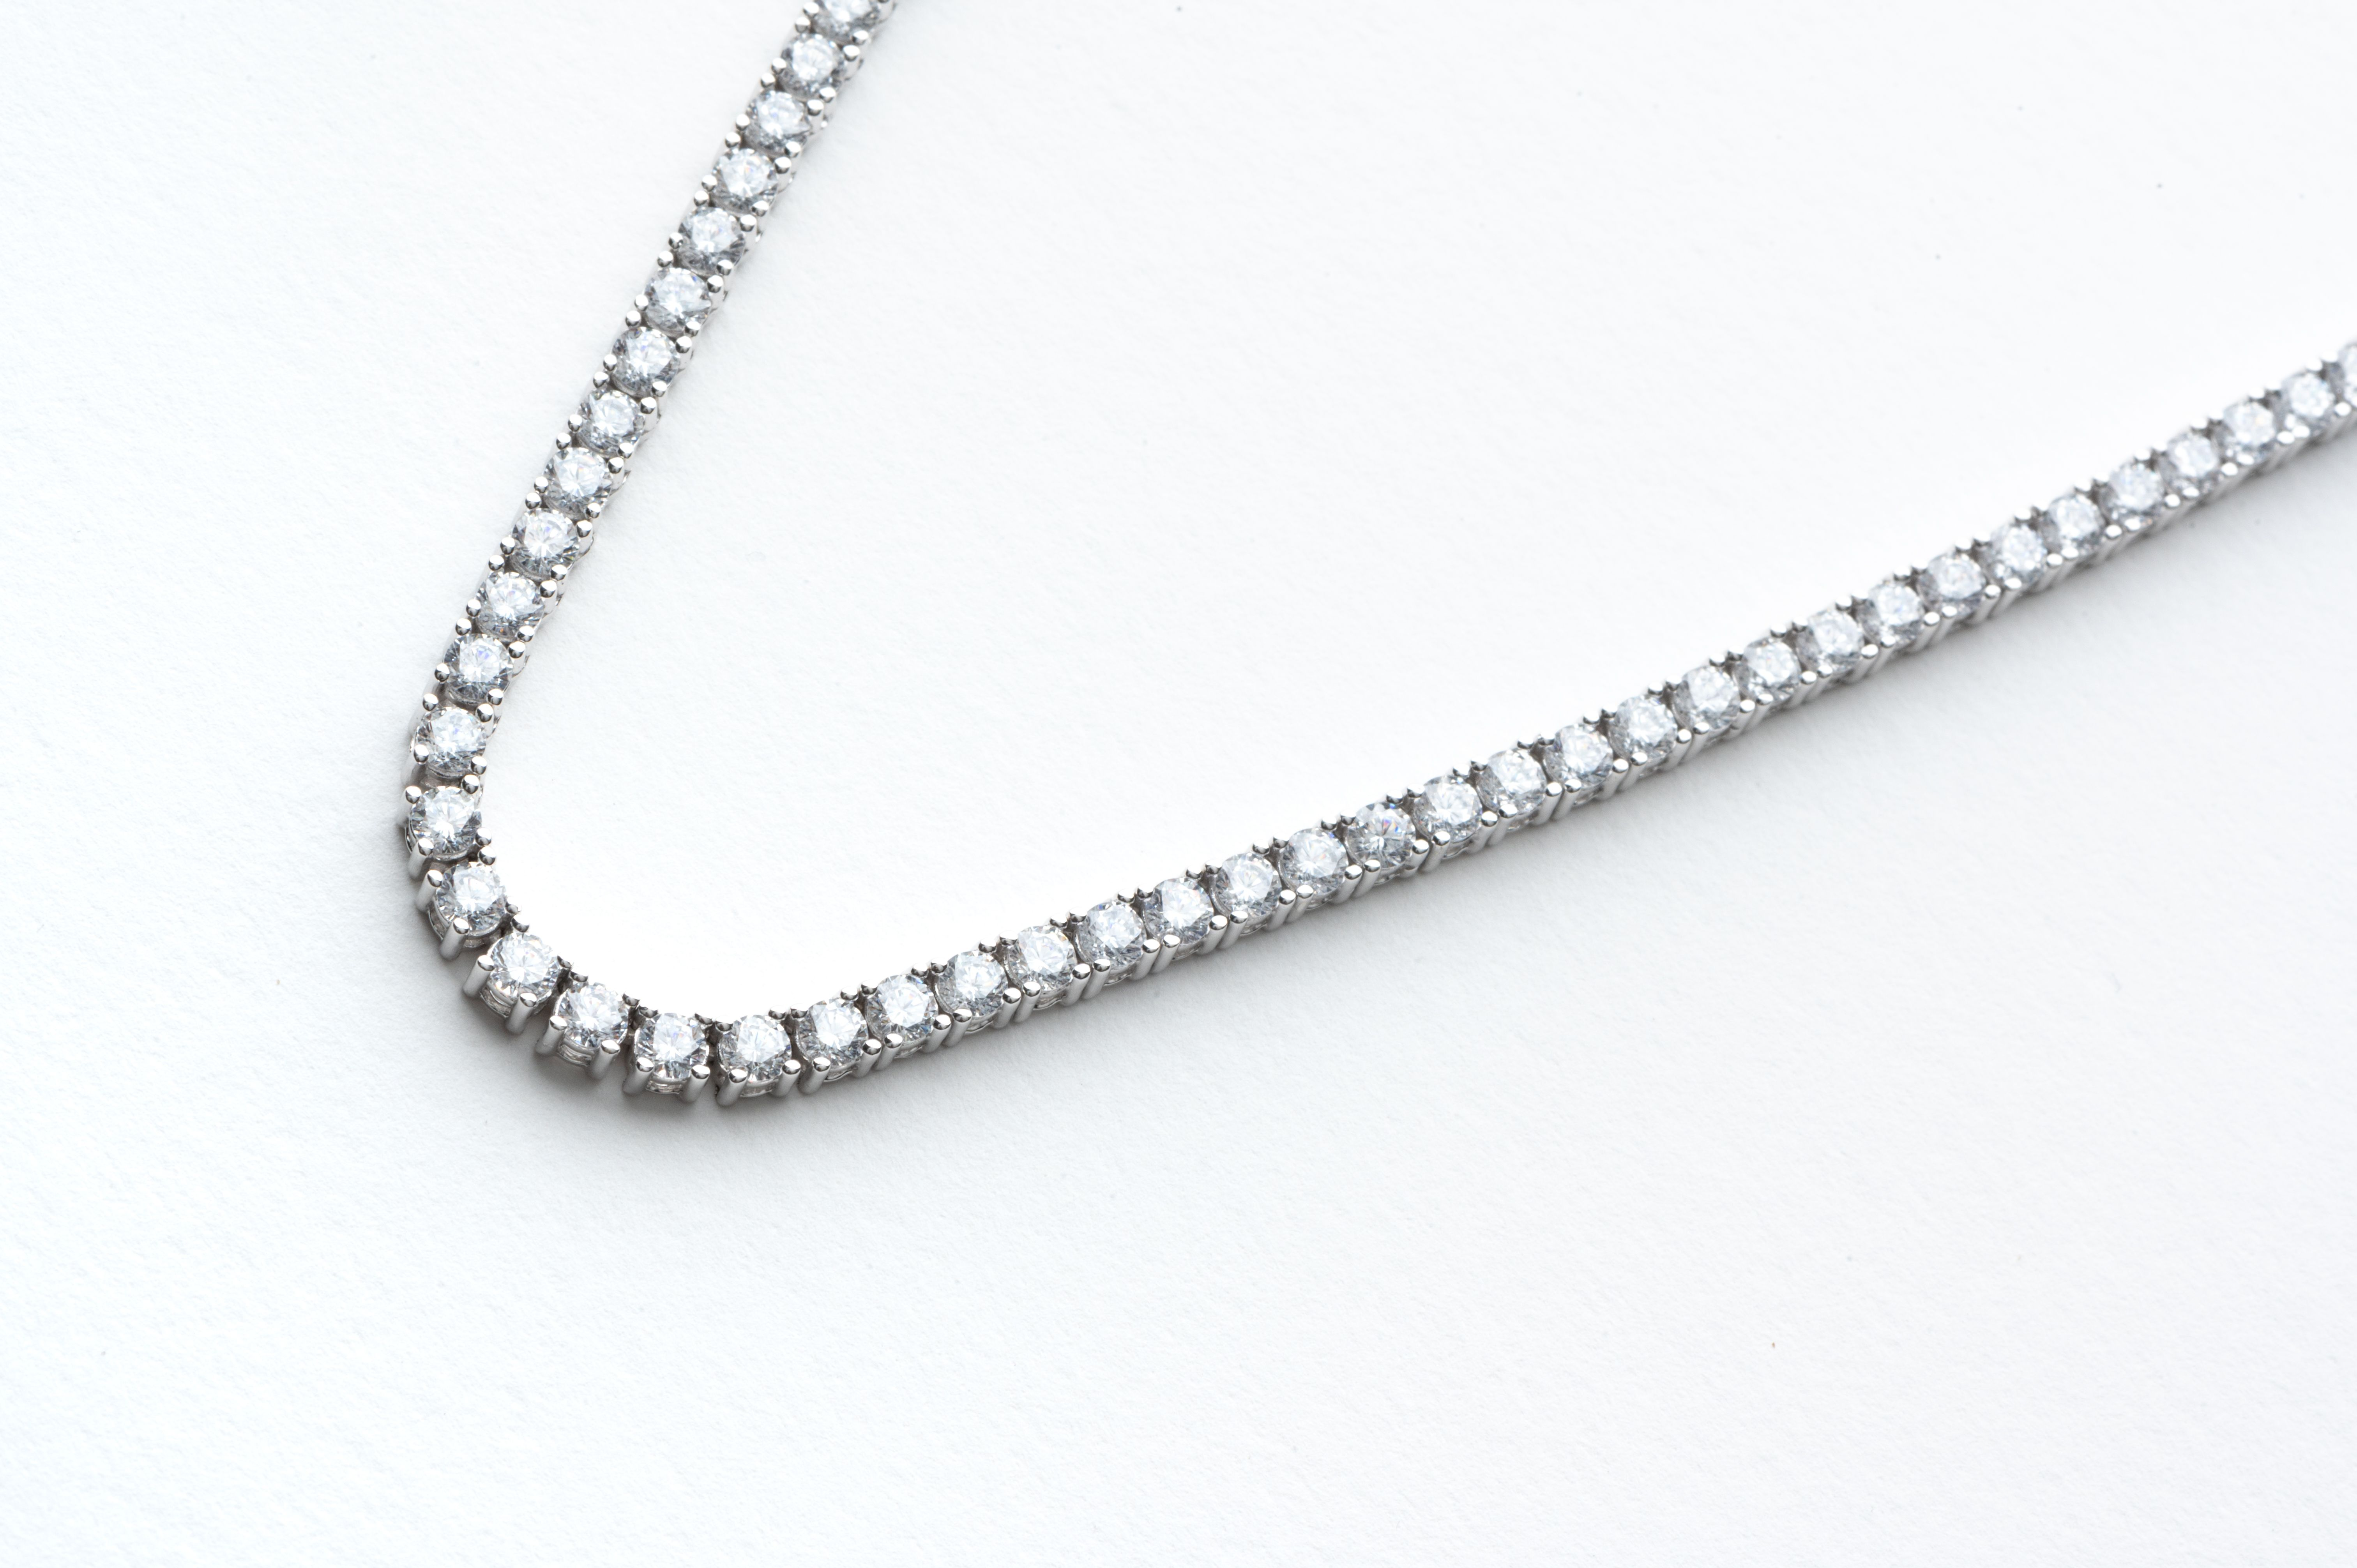 13 Carat G H Si Diamond Tennis Necklace 14k White Gold Diamond Etsy White Gold Necklace Diamond Beautiful Jewelry Diamonds Gold Diamond Necklace